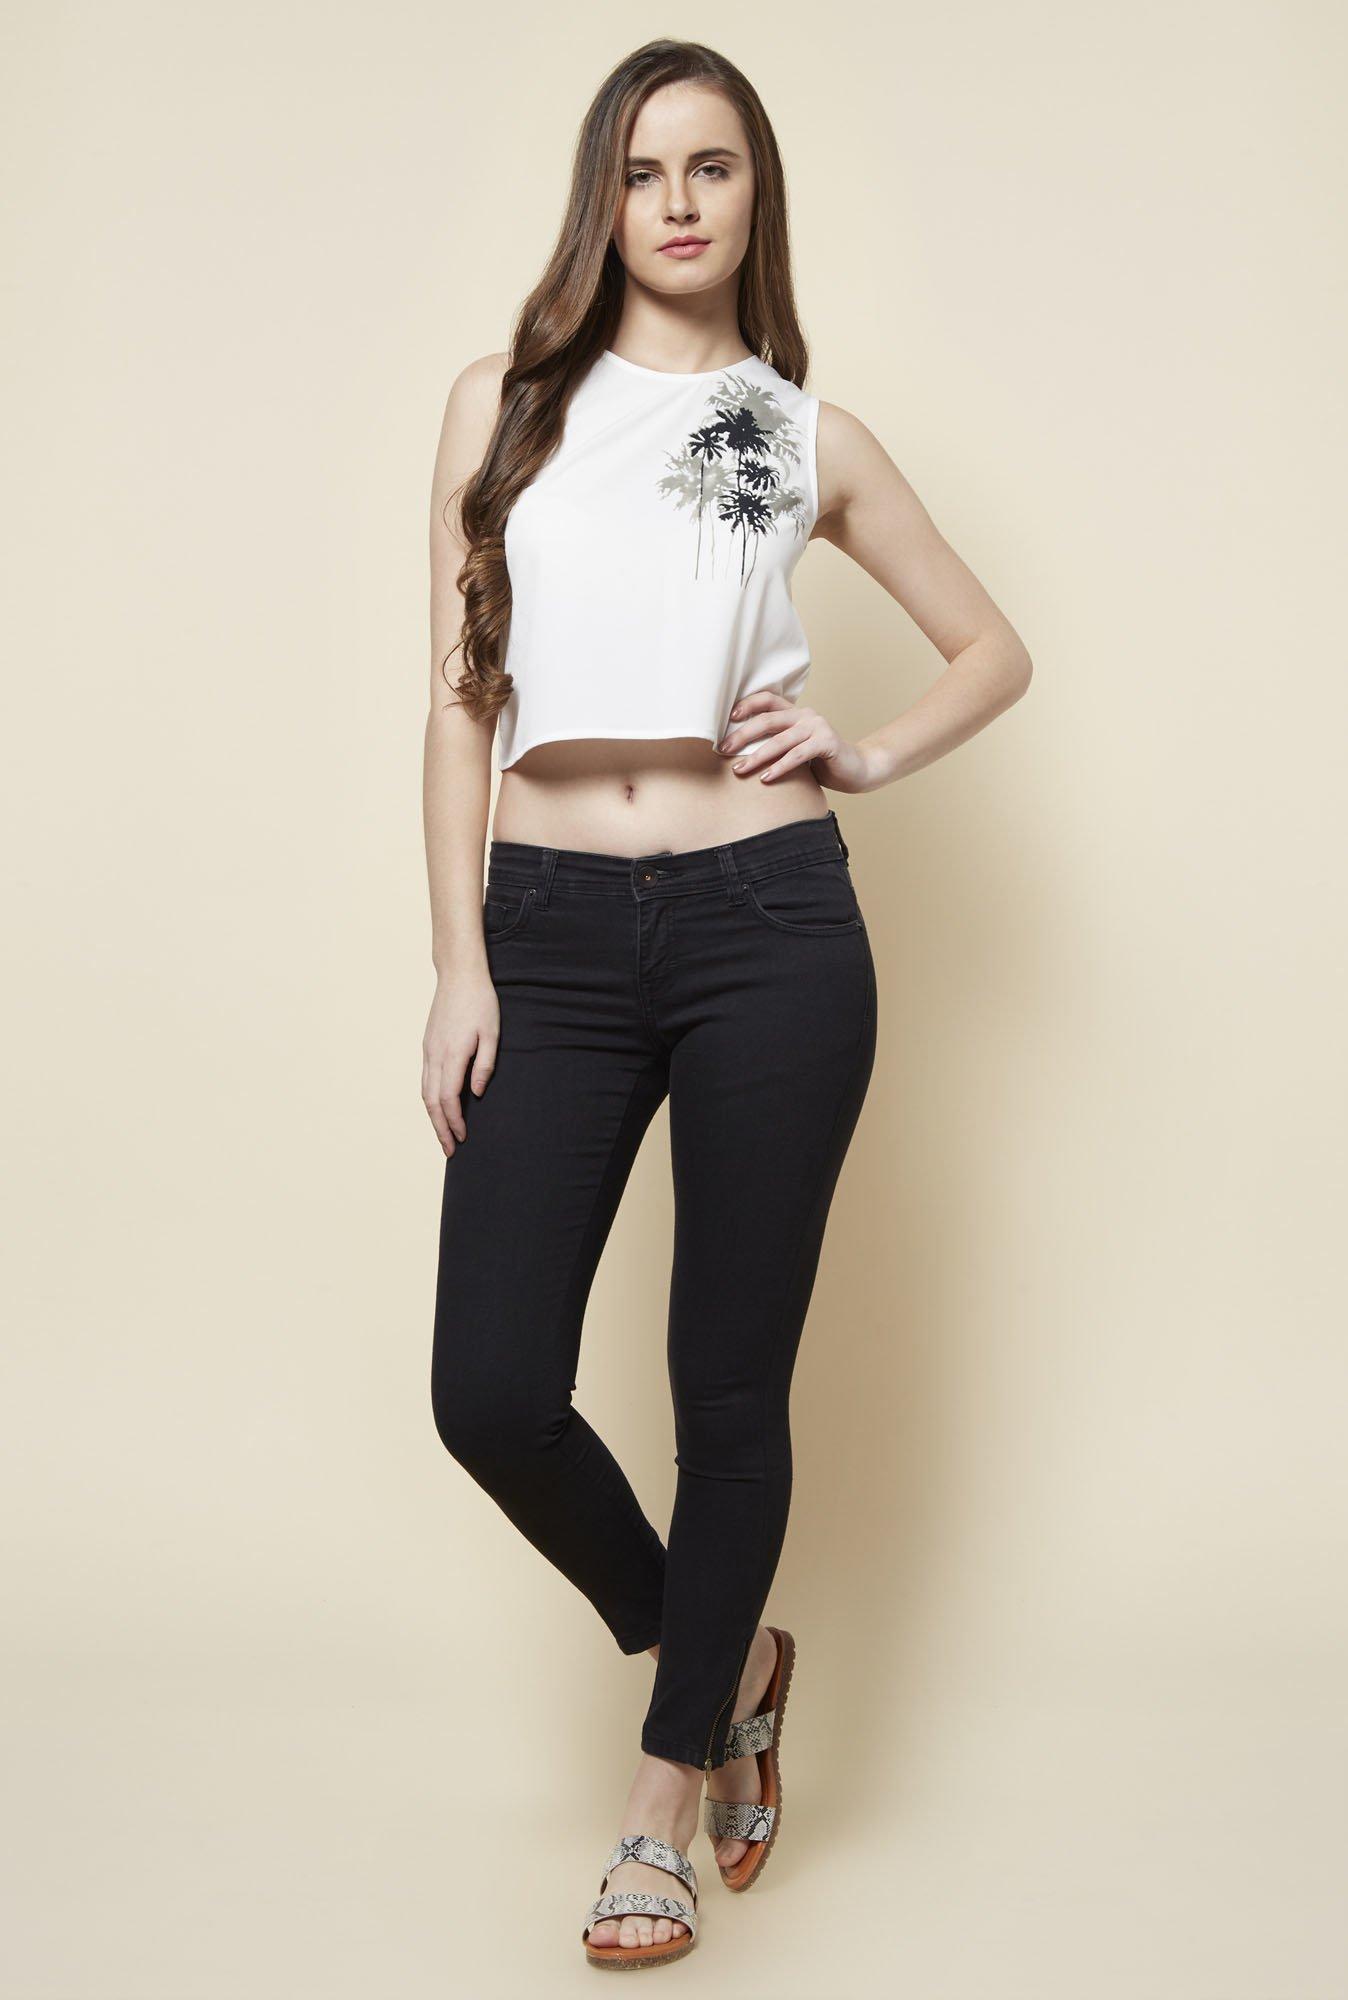 Buy Zudio White Flower Crop Top For Women Online Tata Cliq